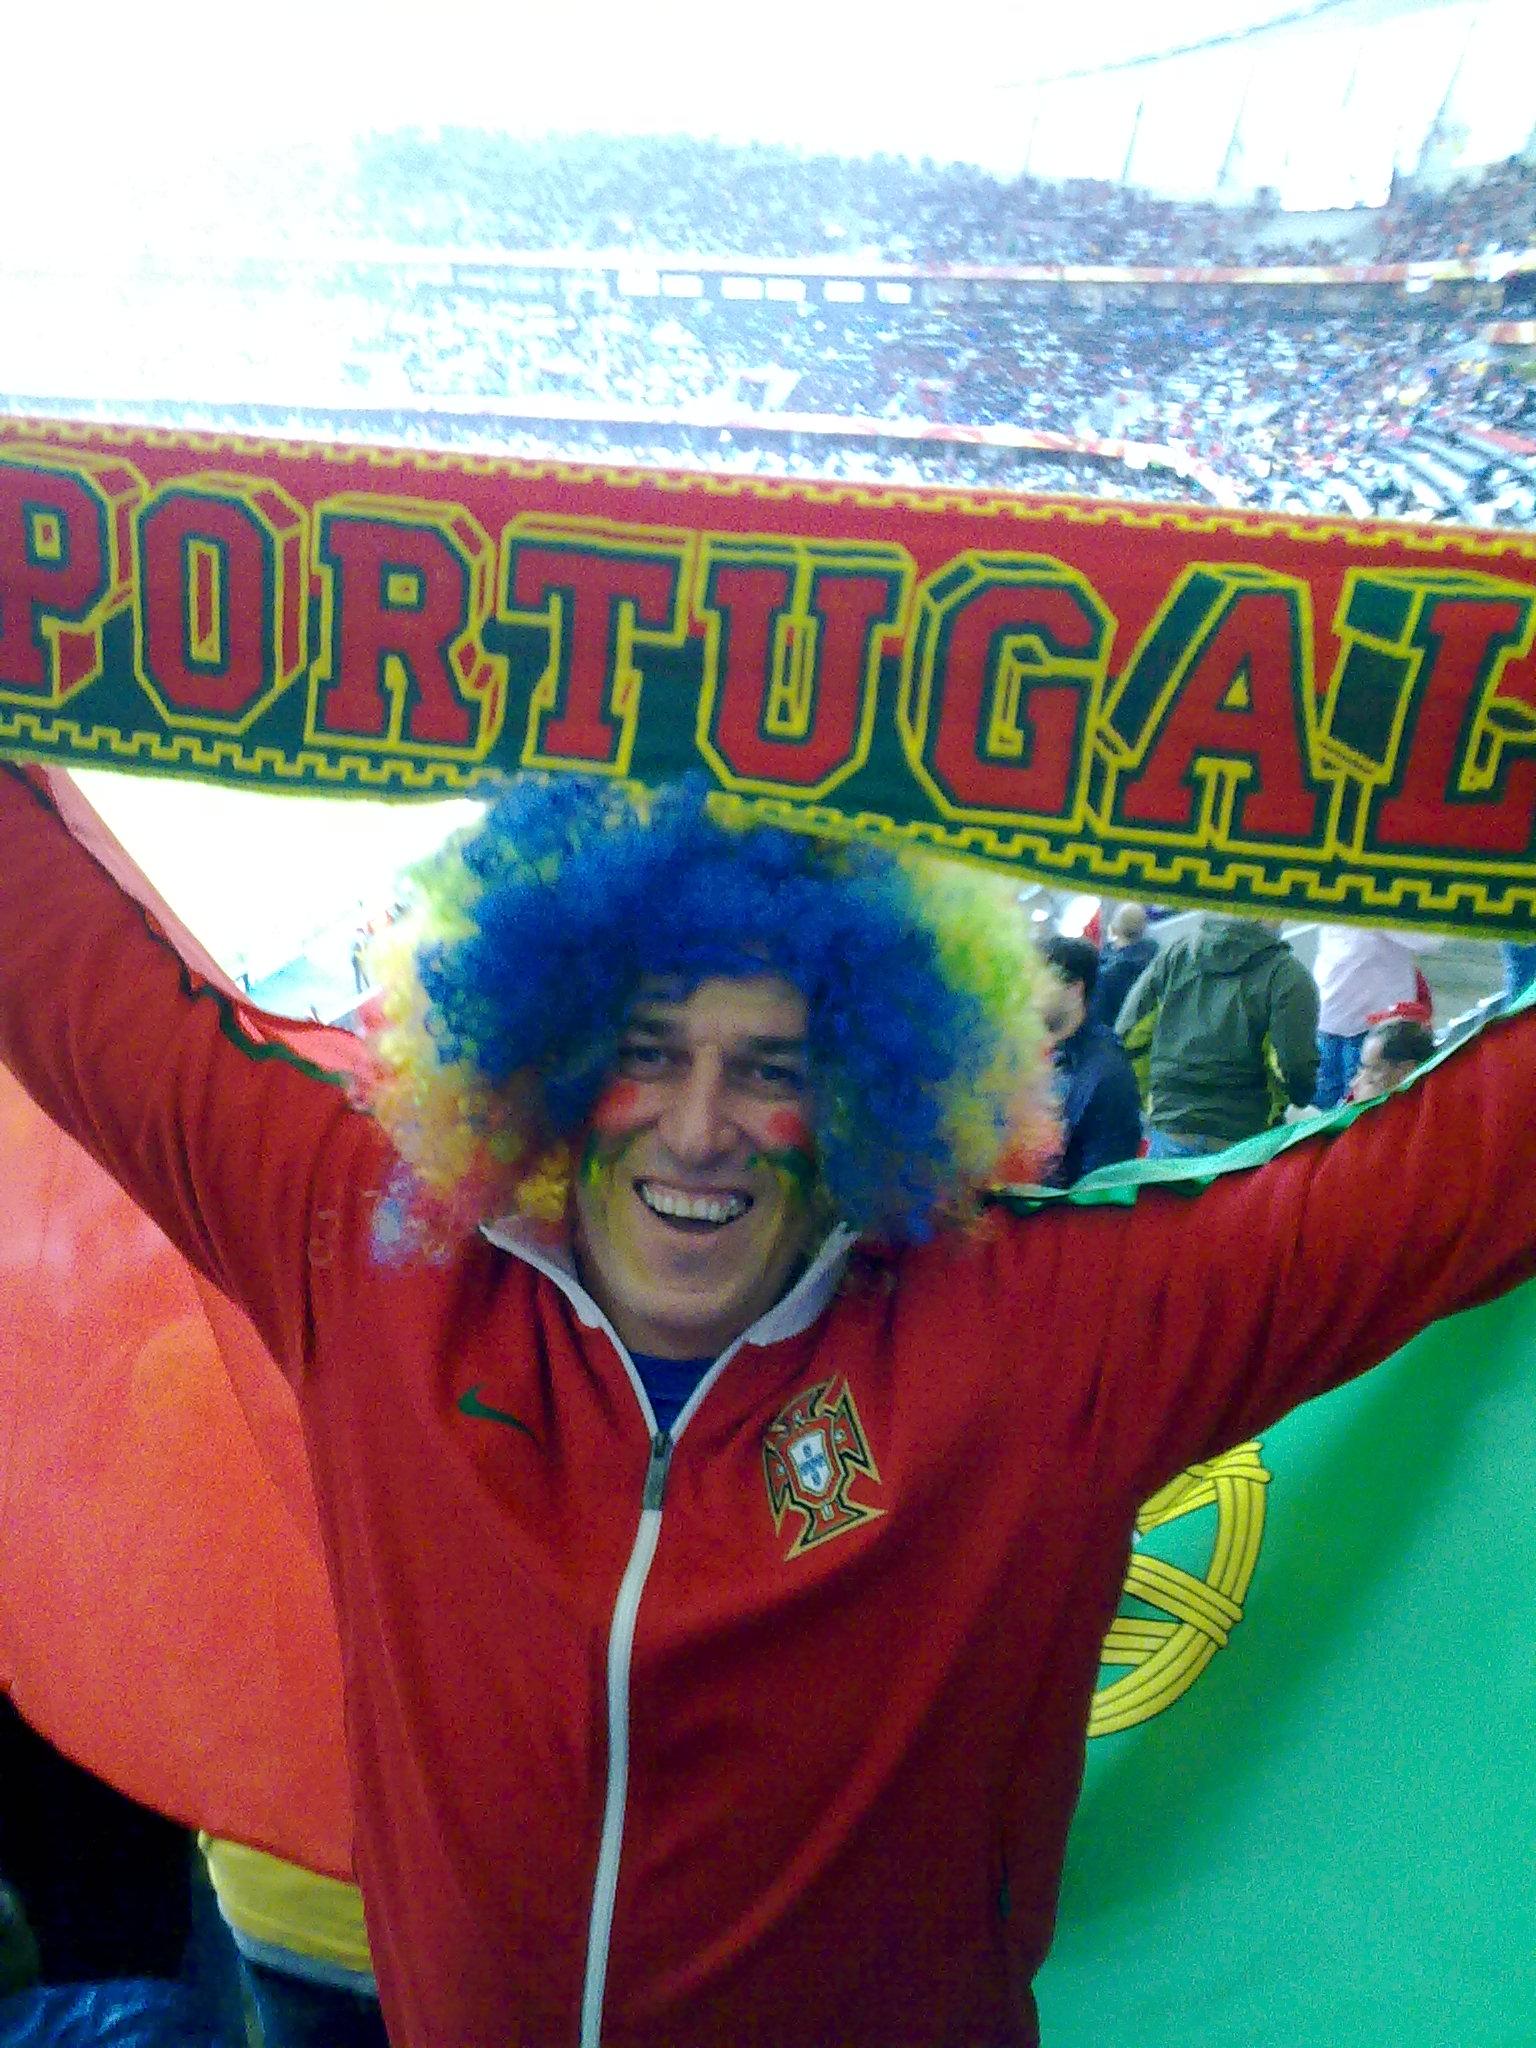 portugals number 1 fan